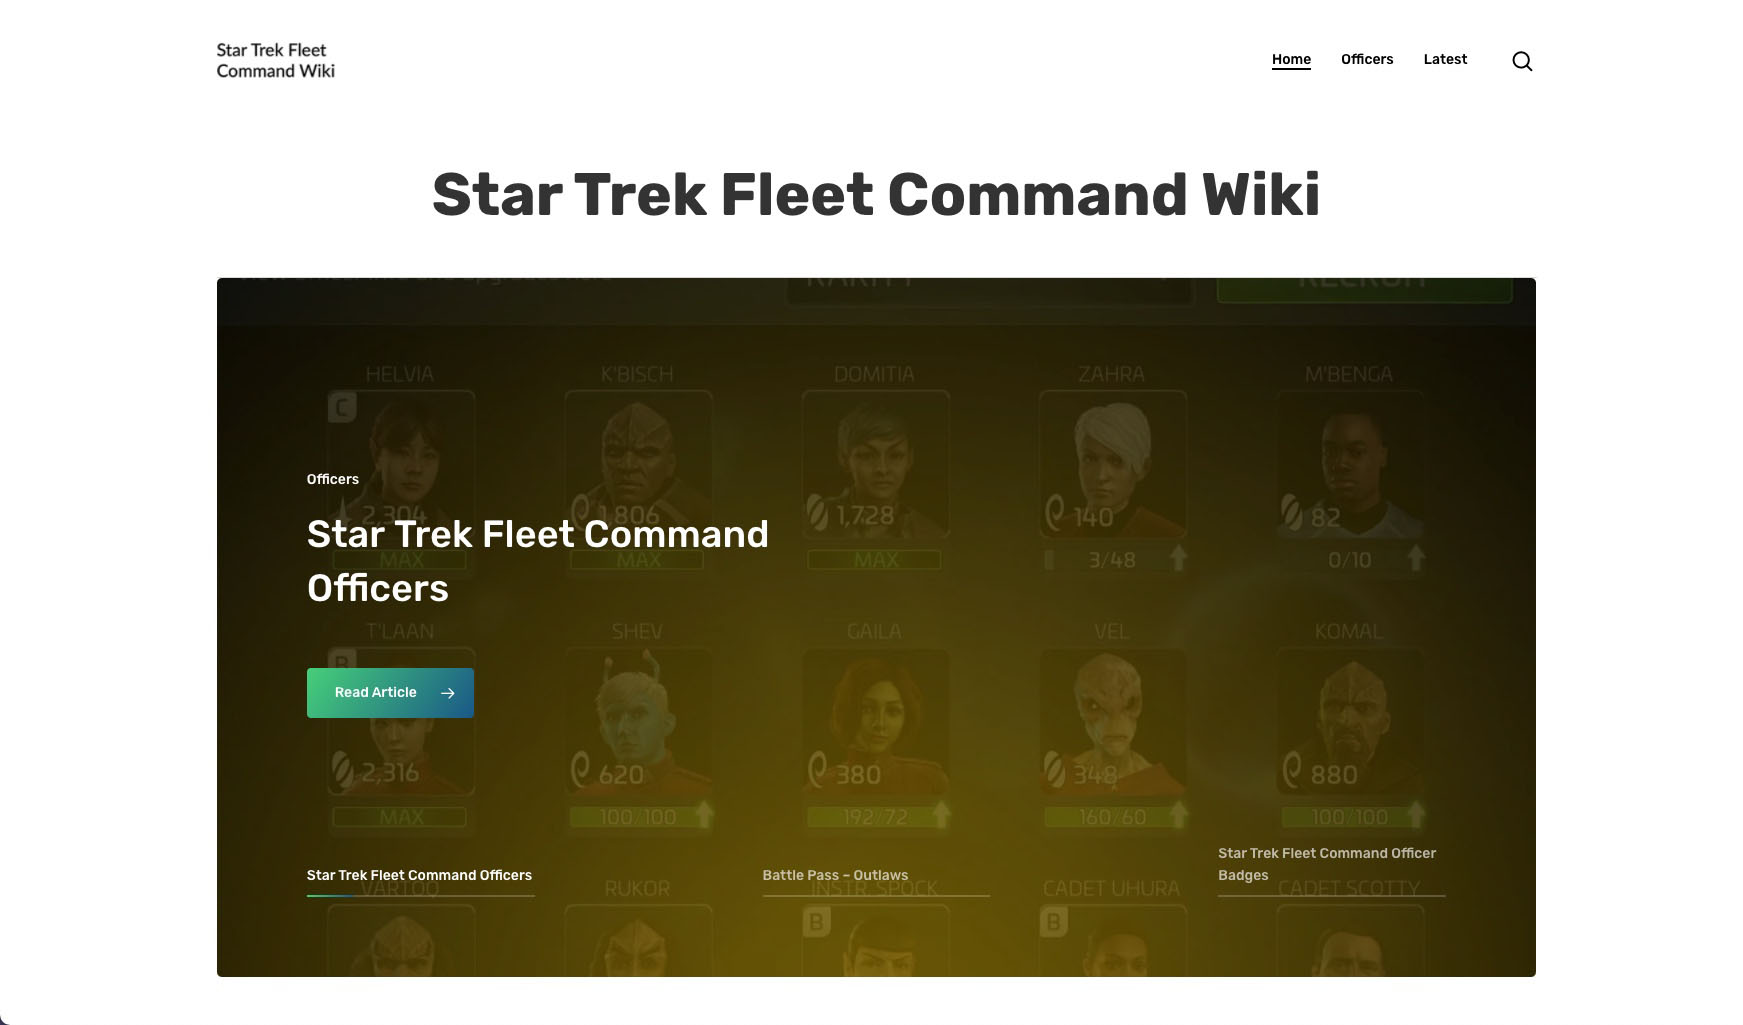 Star Trek Fleet Command Wiki